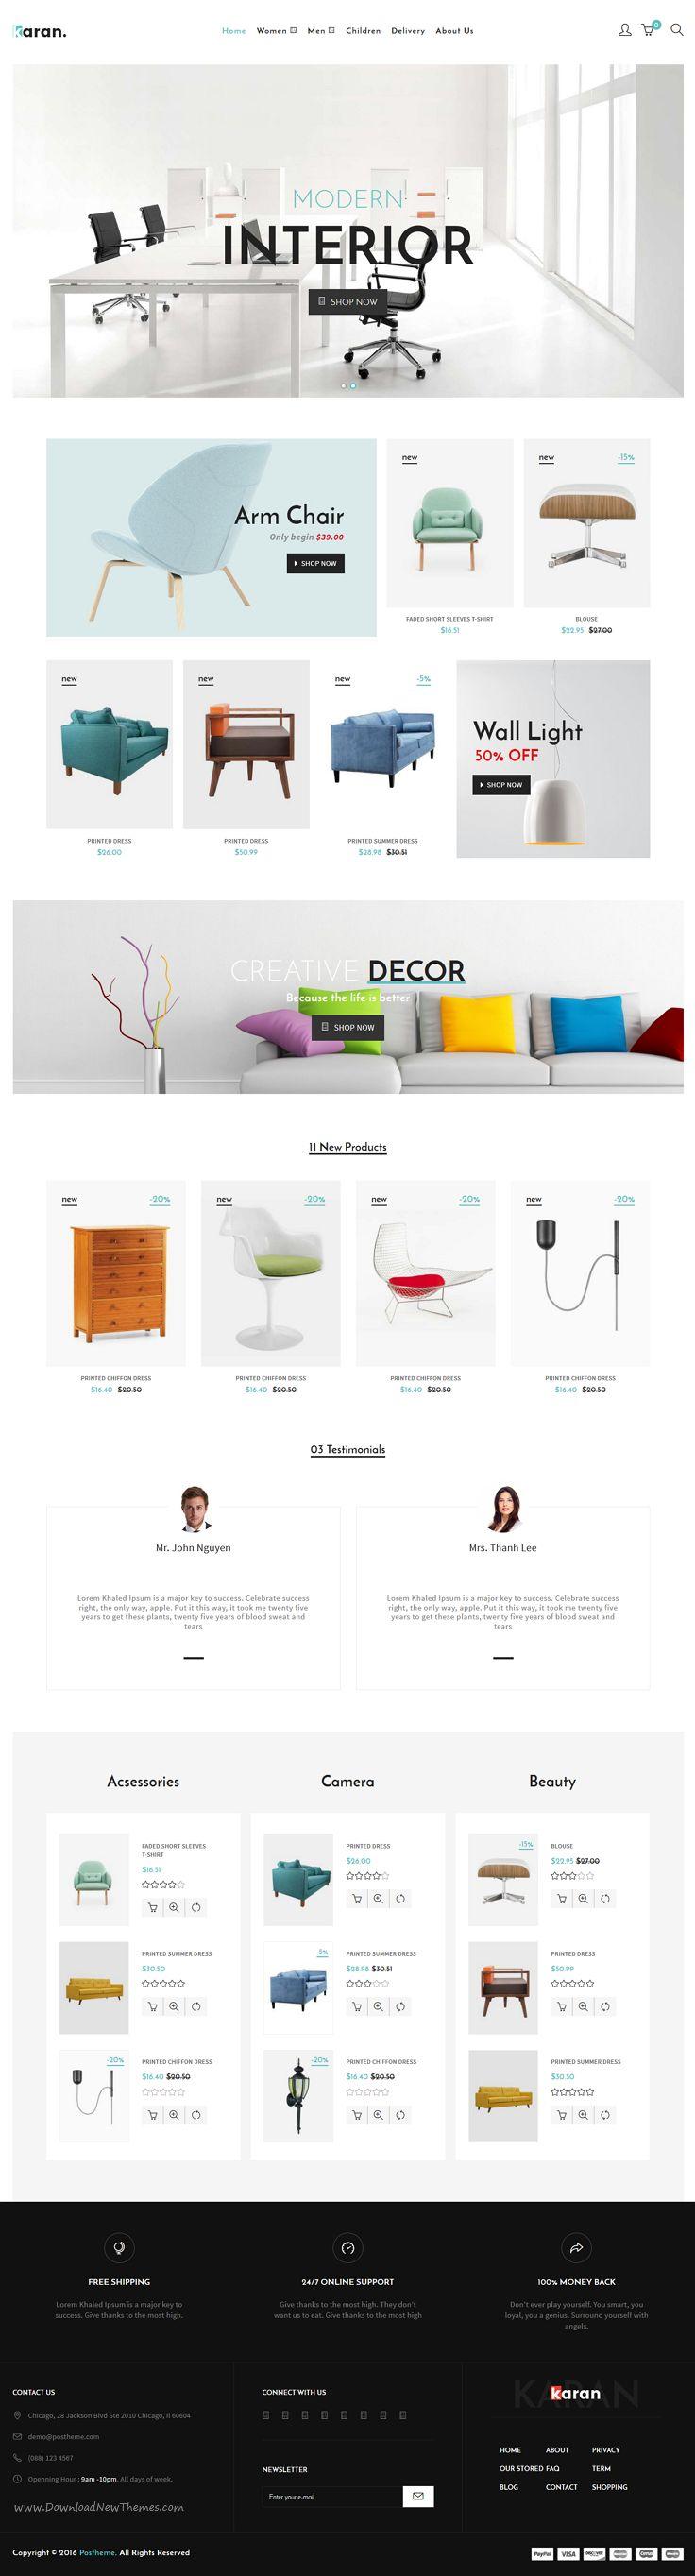 Karan is minimal 8 in 1 #Prestashop Theme for multipurpose fashion and #furniture #shop website download now➝ https://themeforest.net/item/karan-minimal-fashion-prestashop-theme/16823826?ref=Datasata